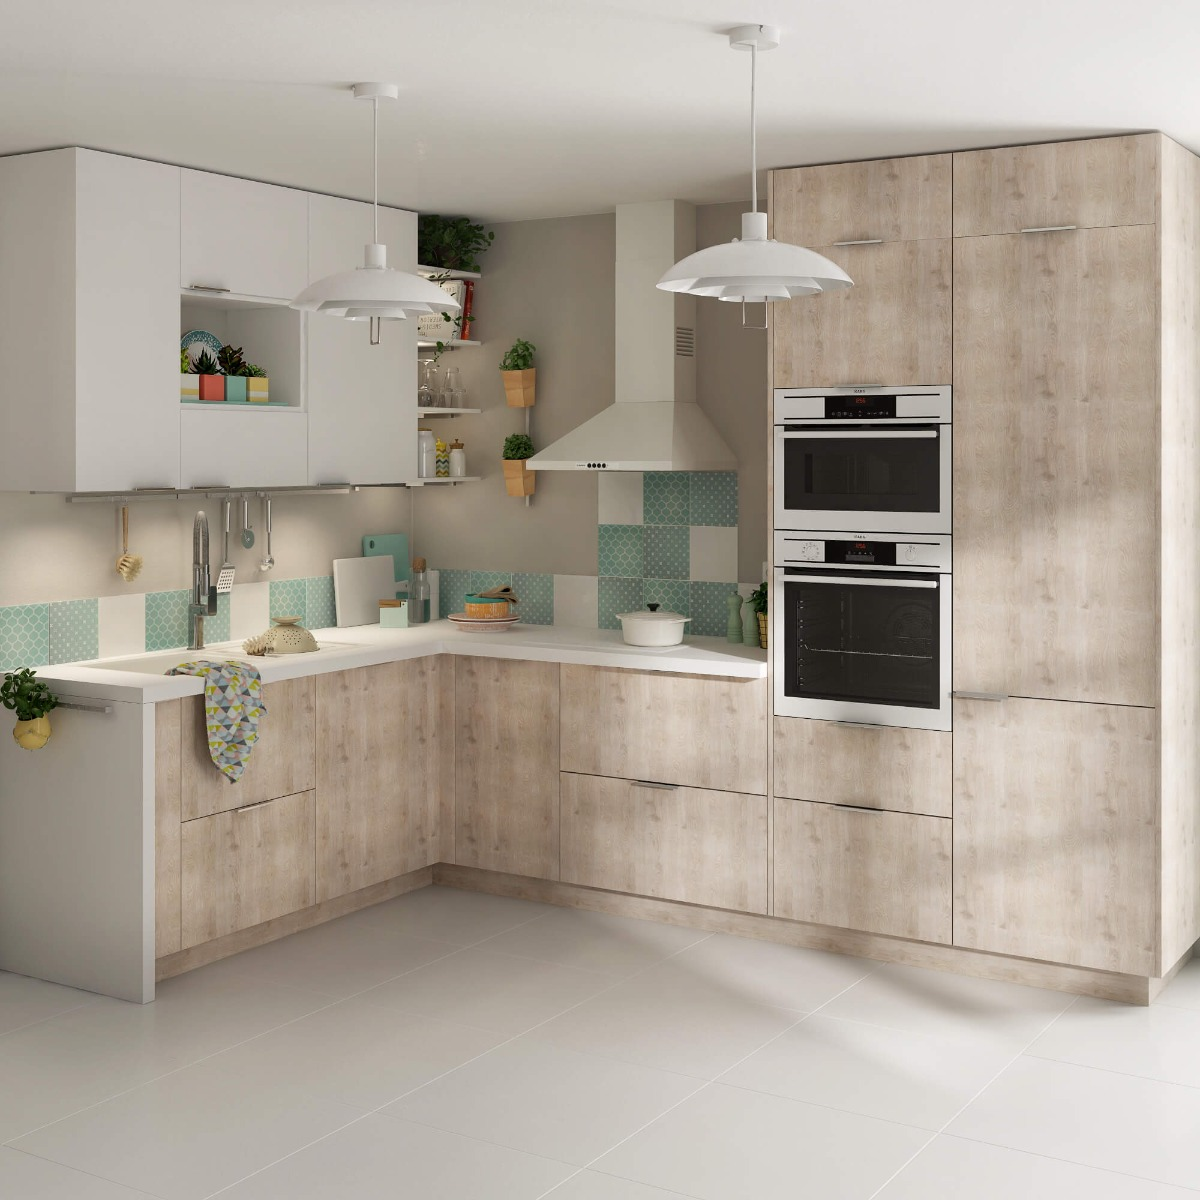 Delinia Nordik Designer Kitchen Mobi - Example 1